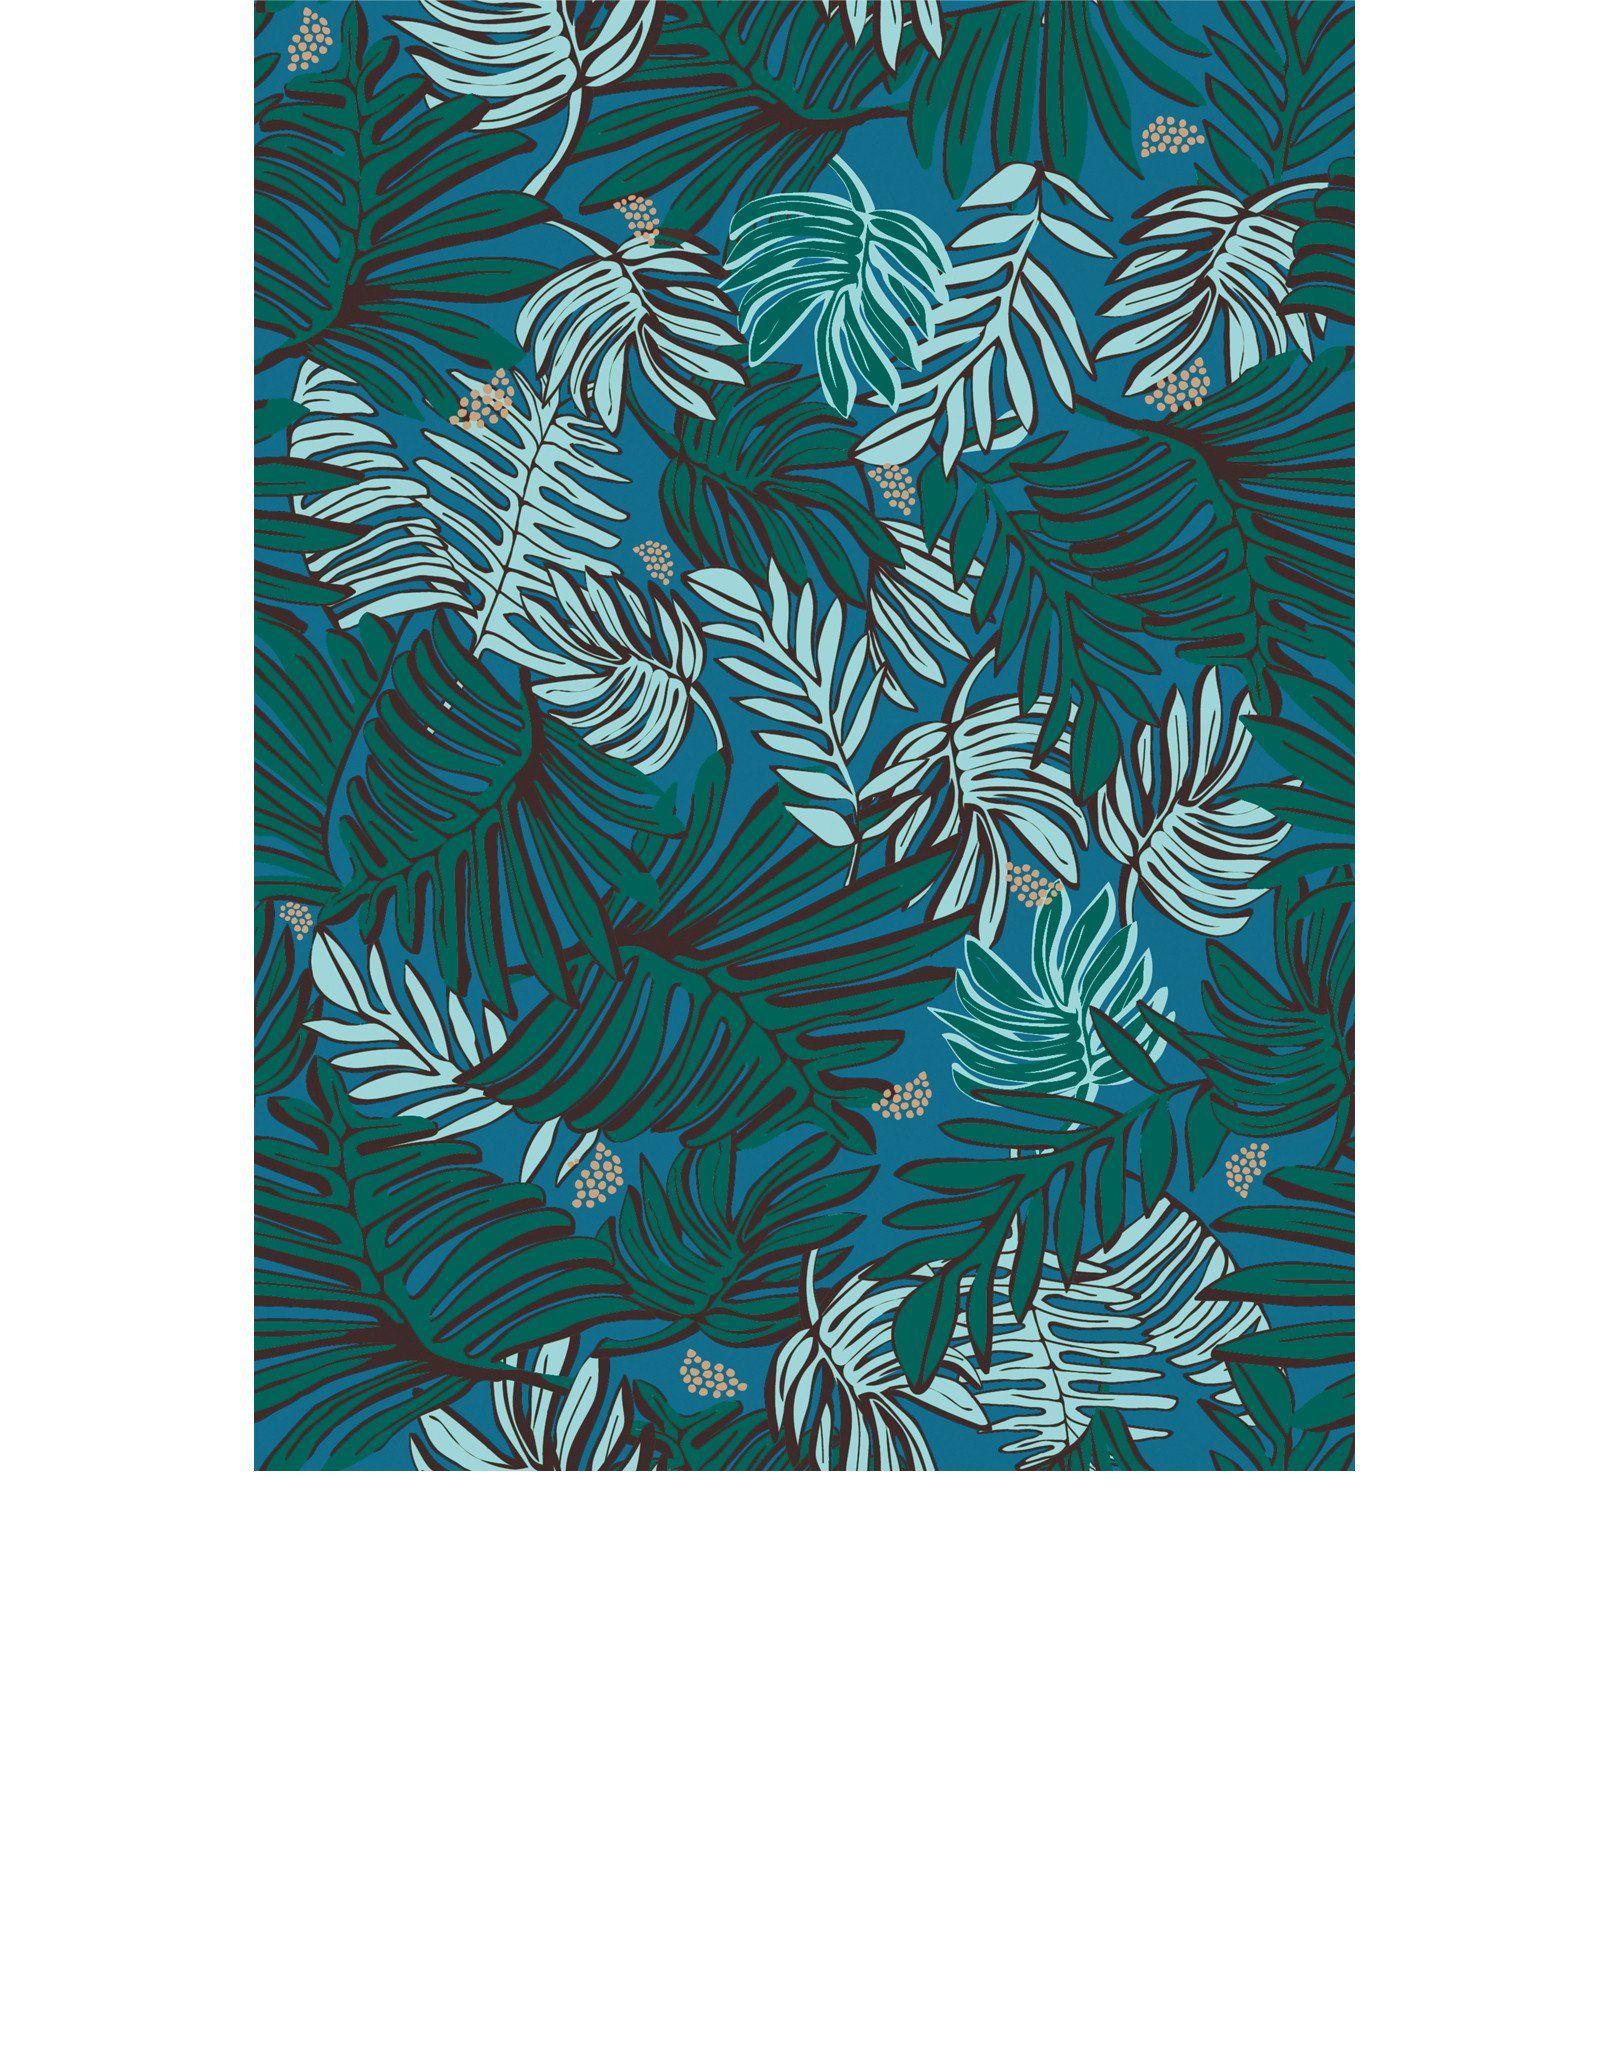 Aja (Teal) Tiles, Set of Tiles | Pinterest | Hygge, Apartment ...